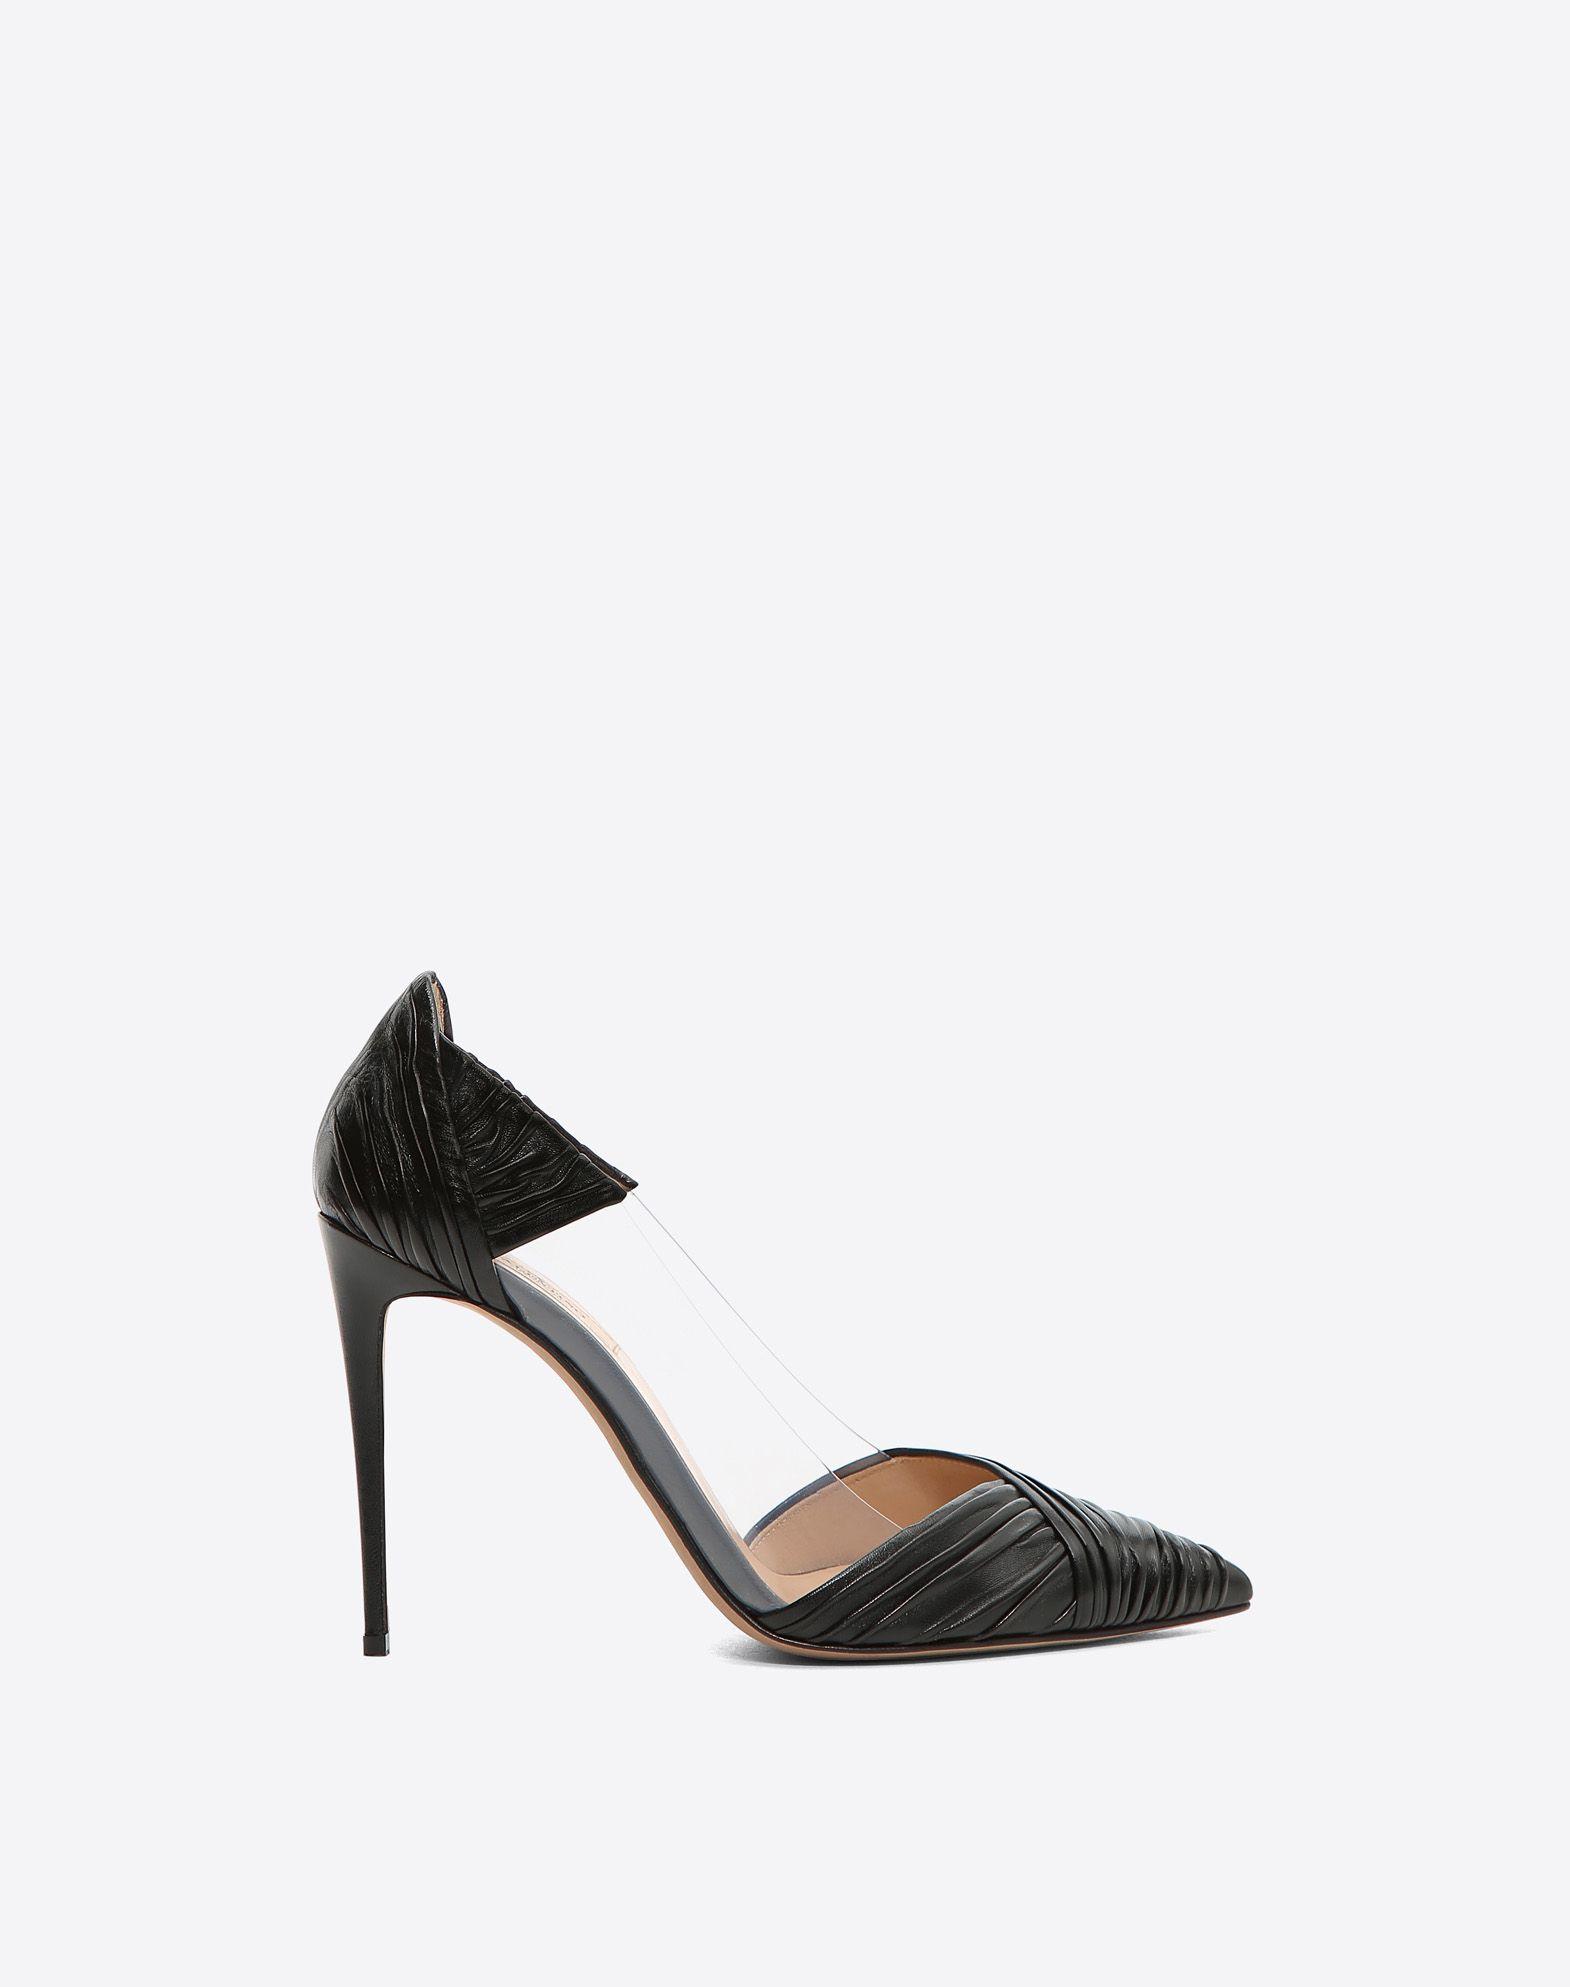 VALENTINO Narrow toeline Spike heel  11149247la